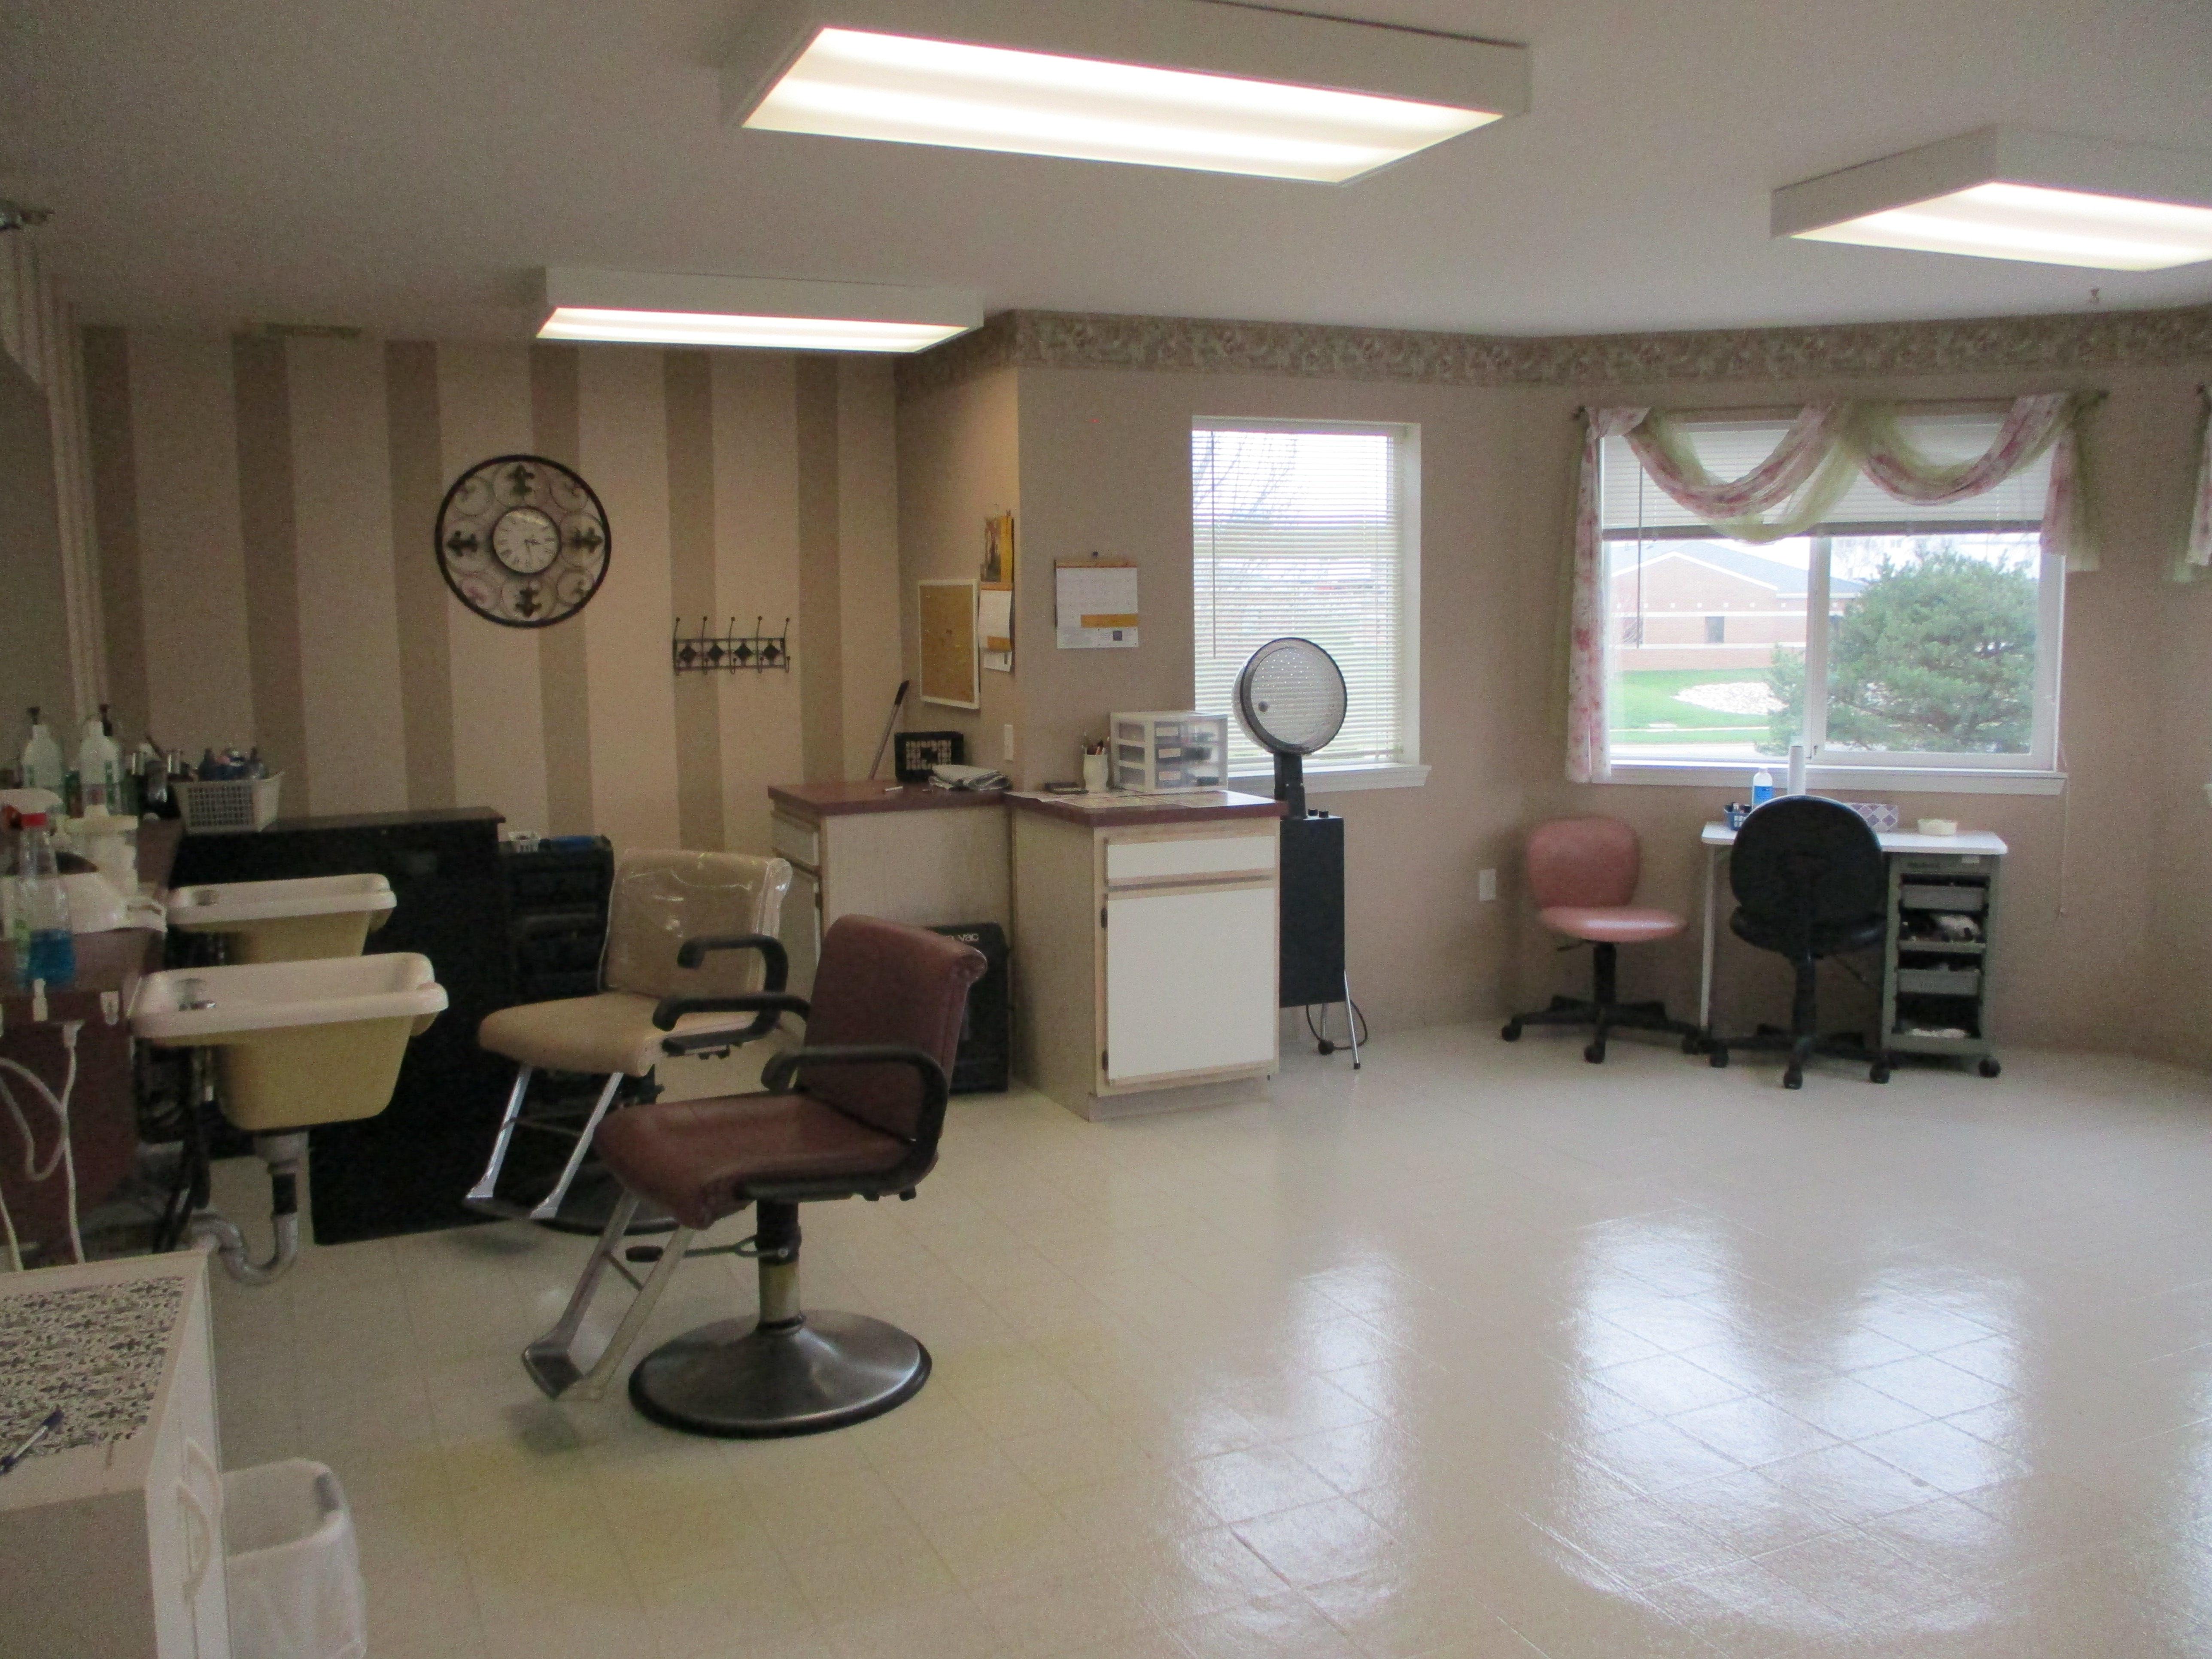 Hair Salon For Rent in Cedar Falls! image 1